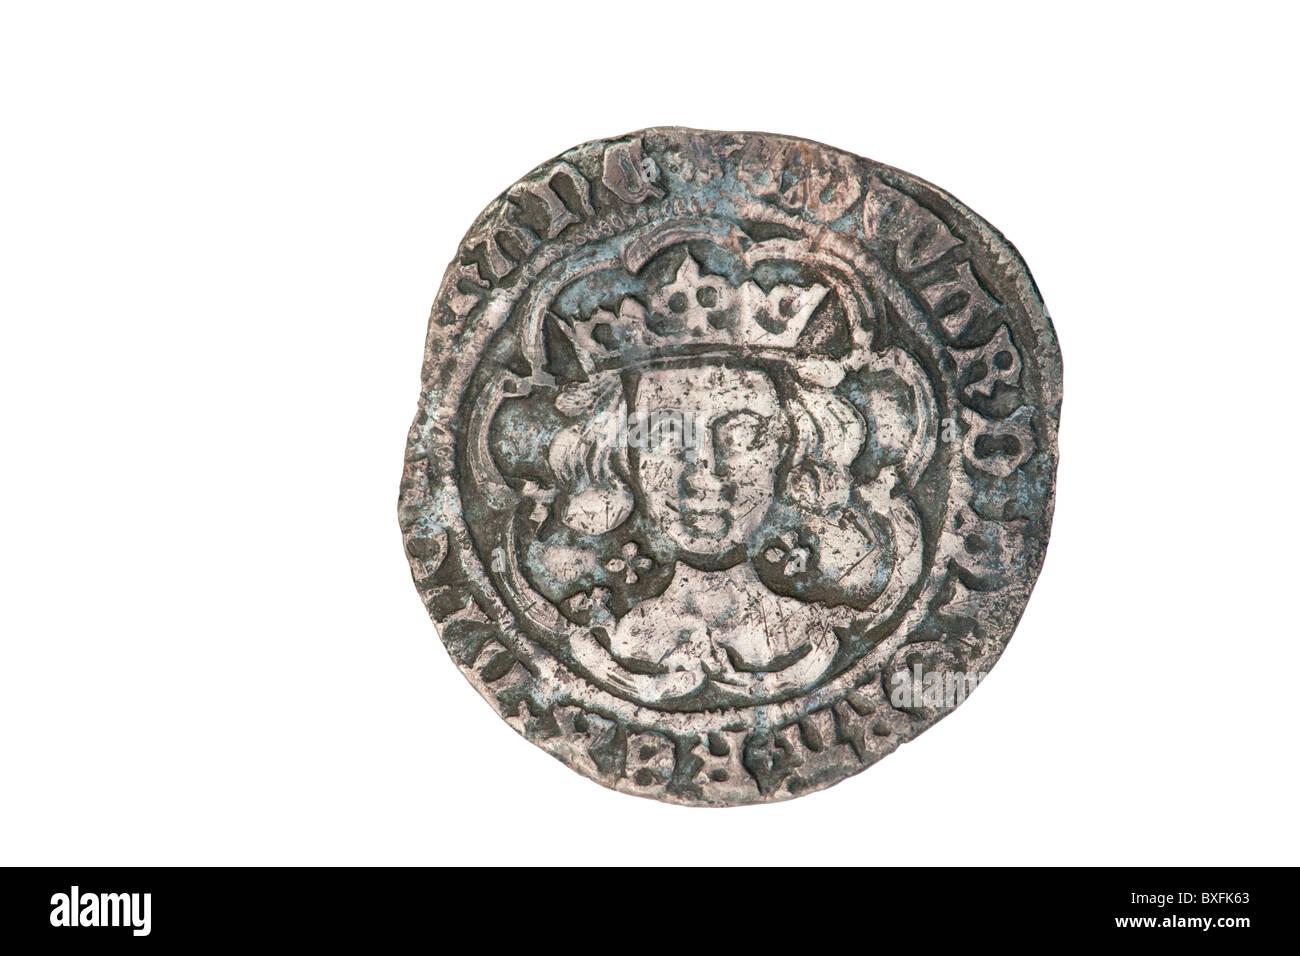 Silver groat of King Edward - obverse - Stock Image